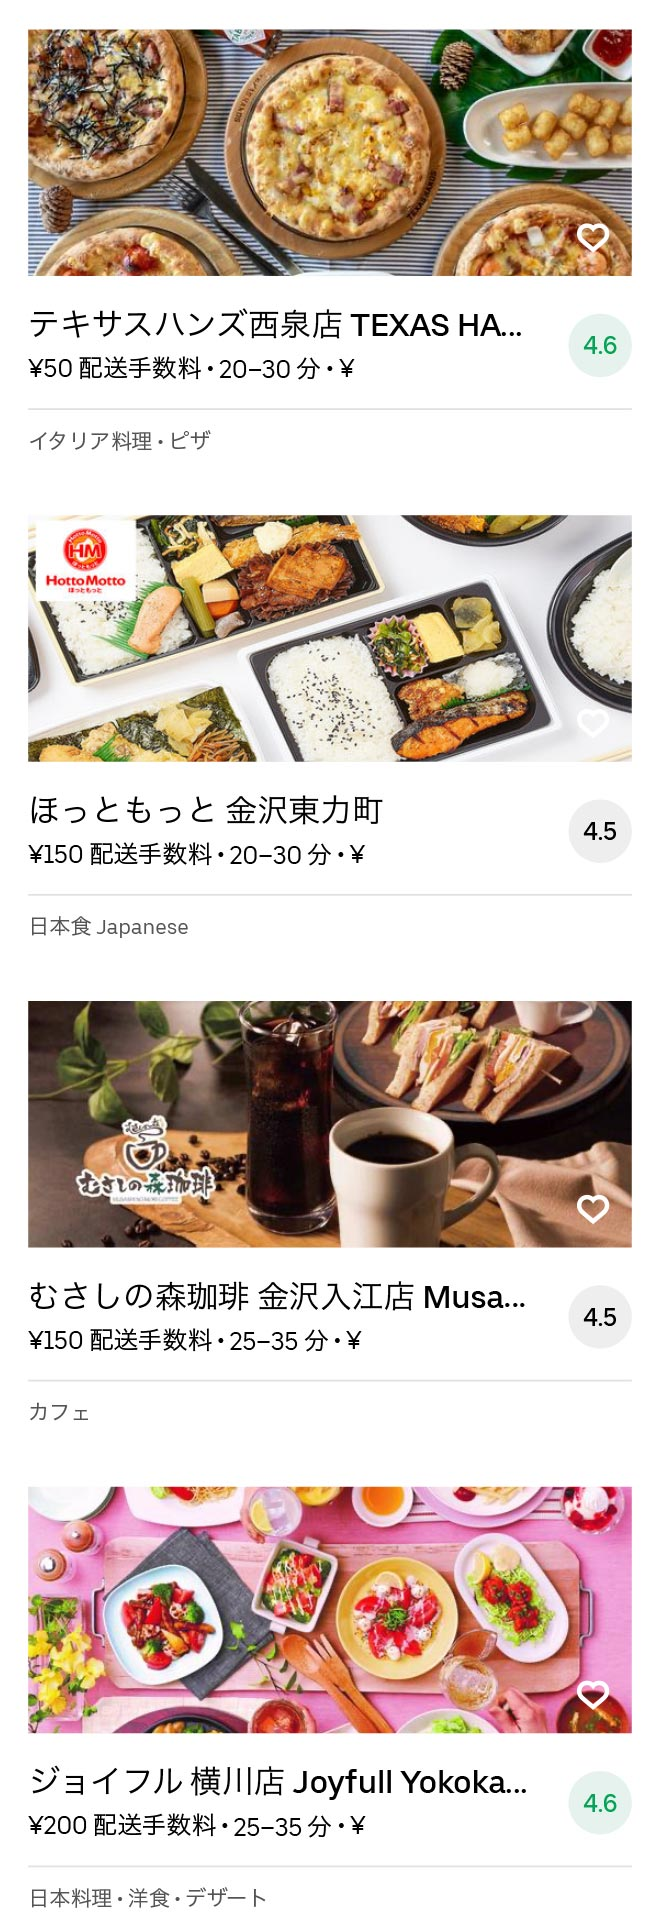 Nishi kanazawa menu 2009 05